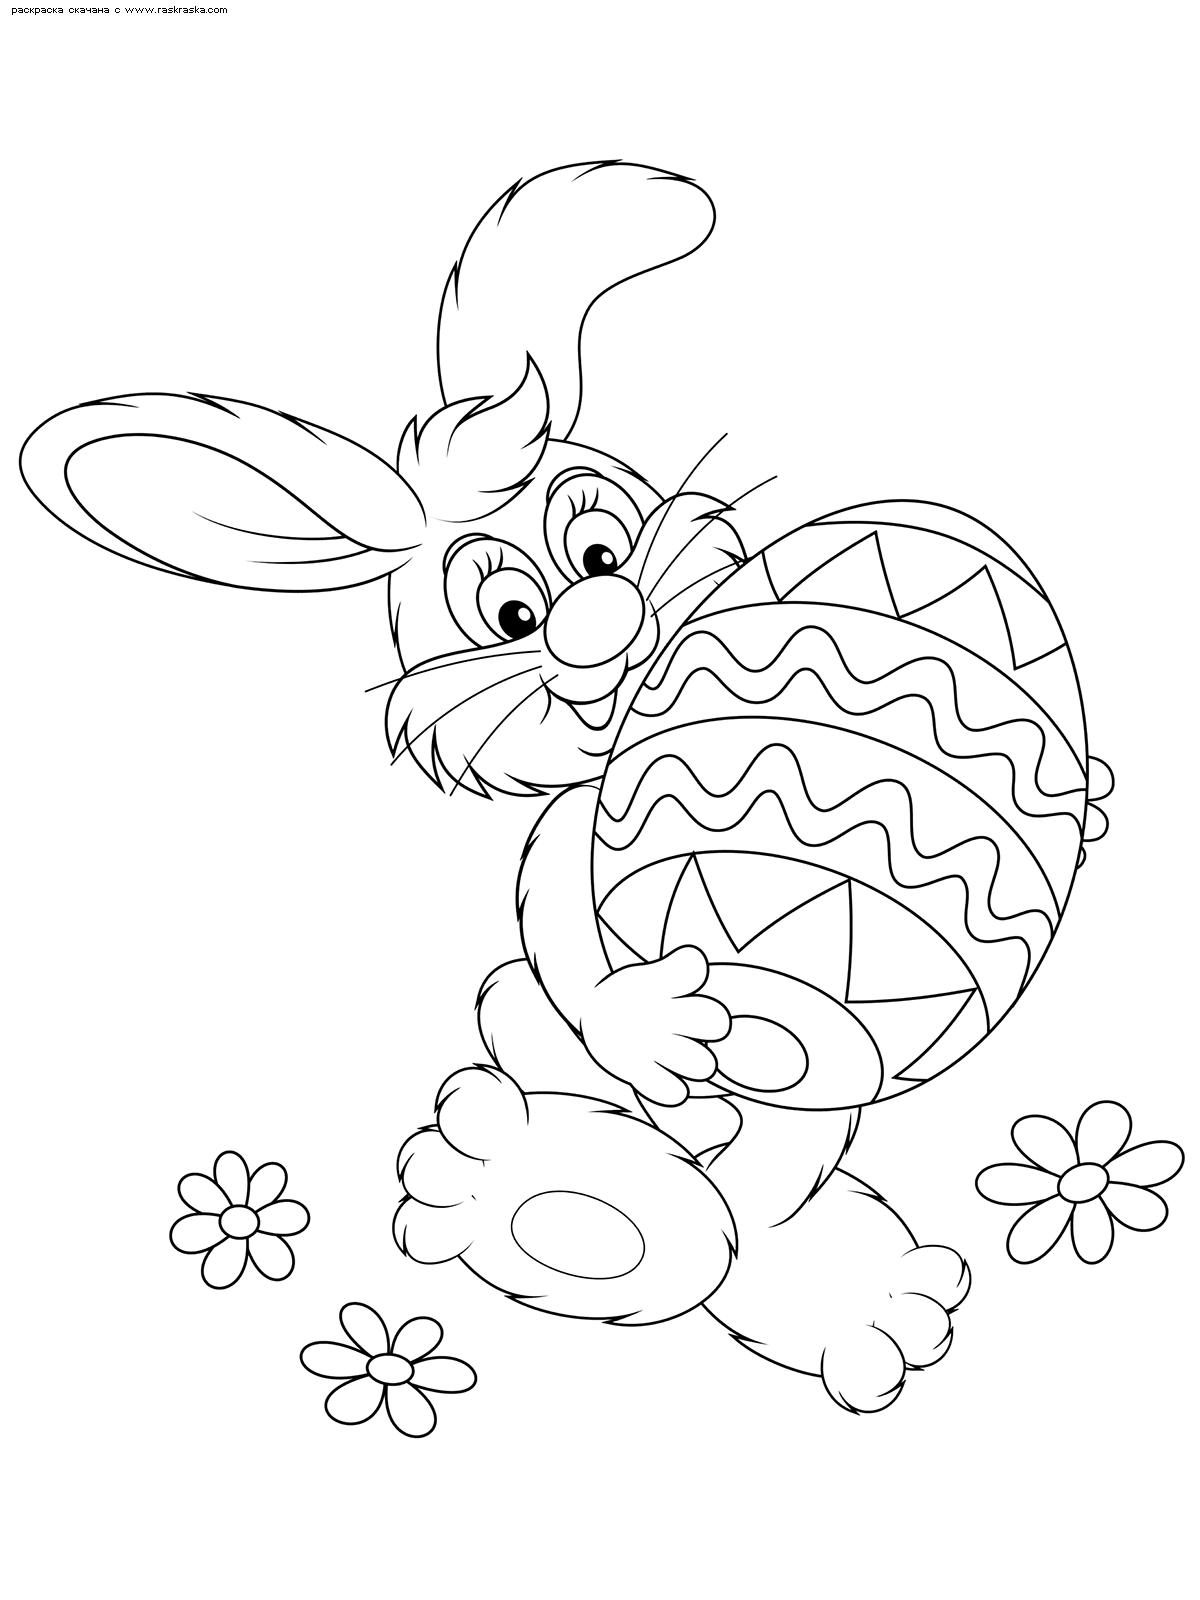 Раскраска Пасхальный кролик. Раскраска пасха, кролик, яйцо